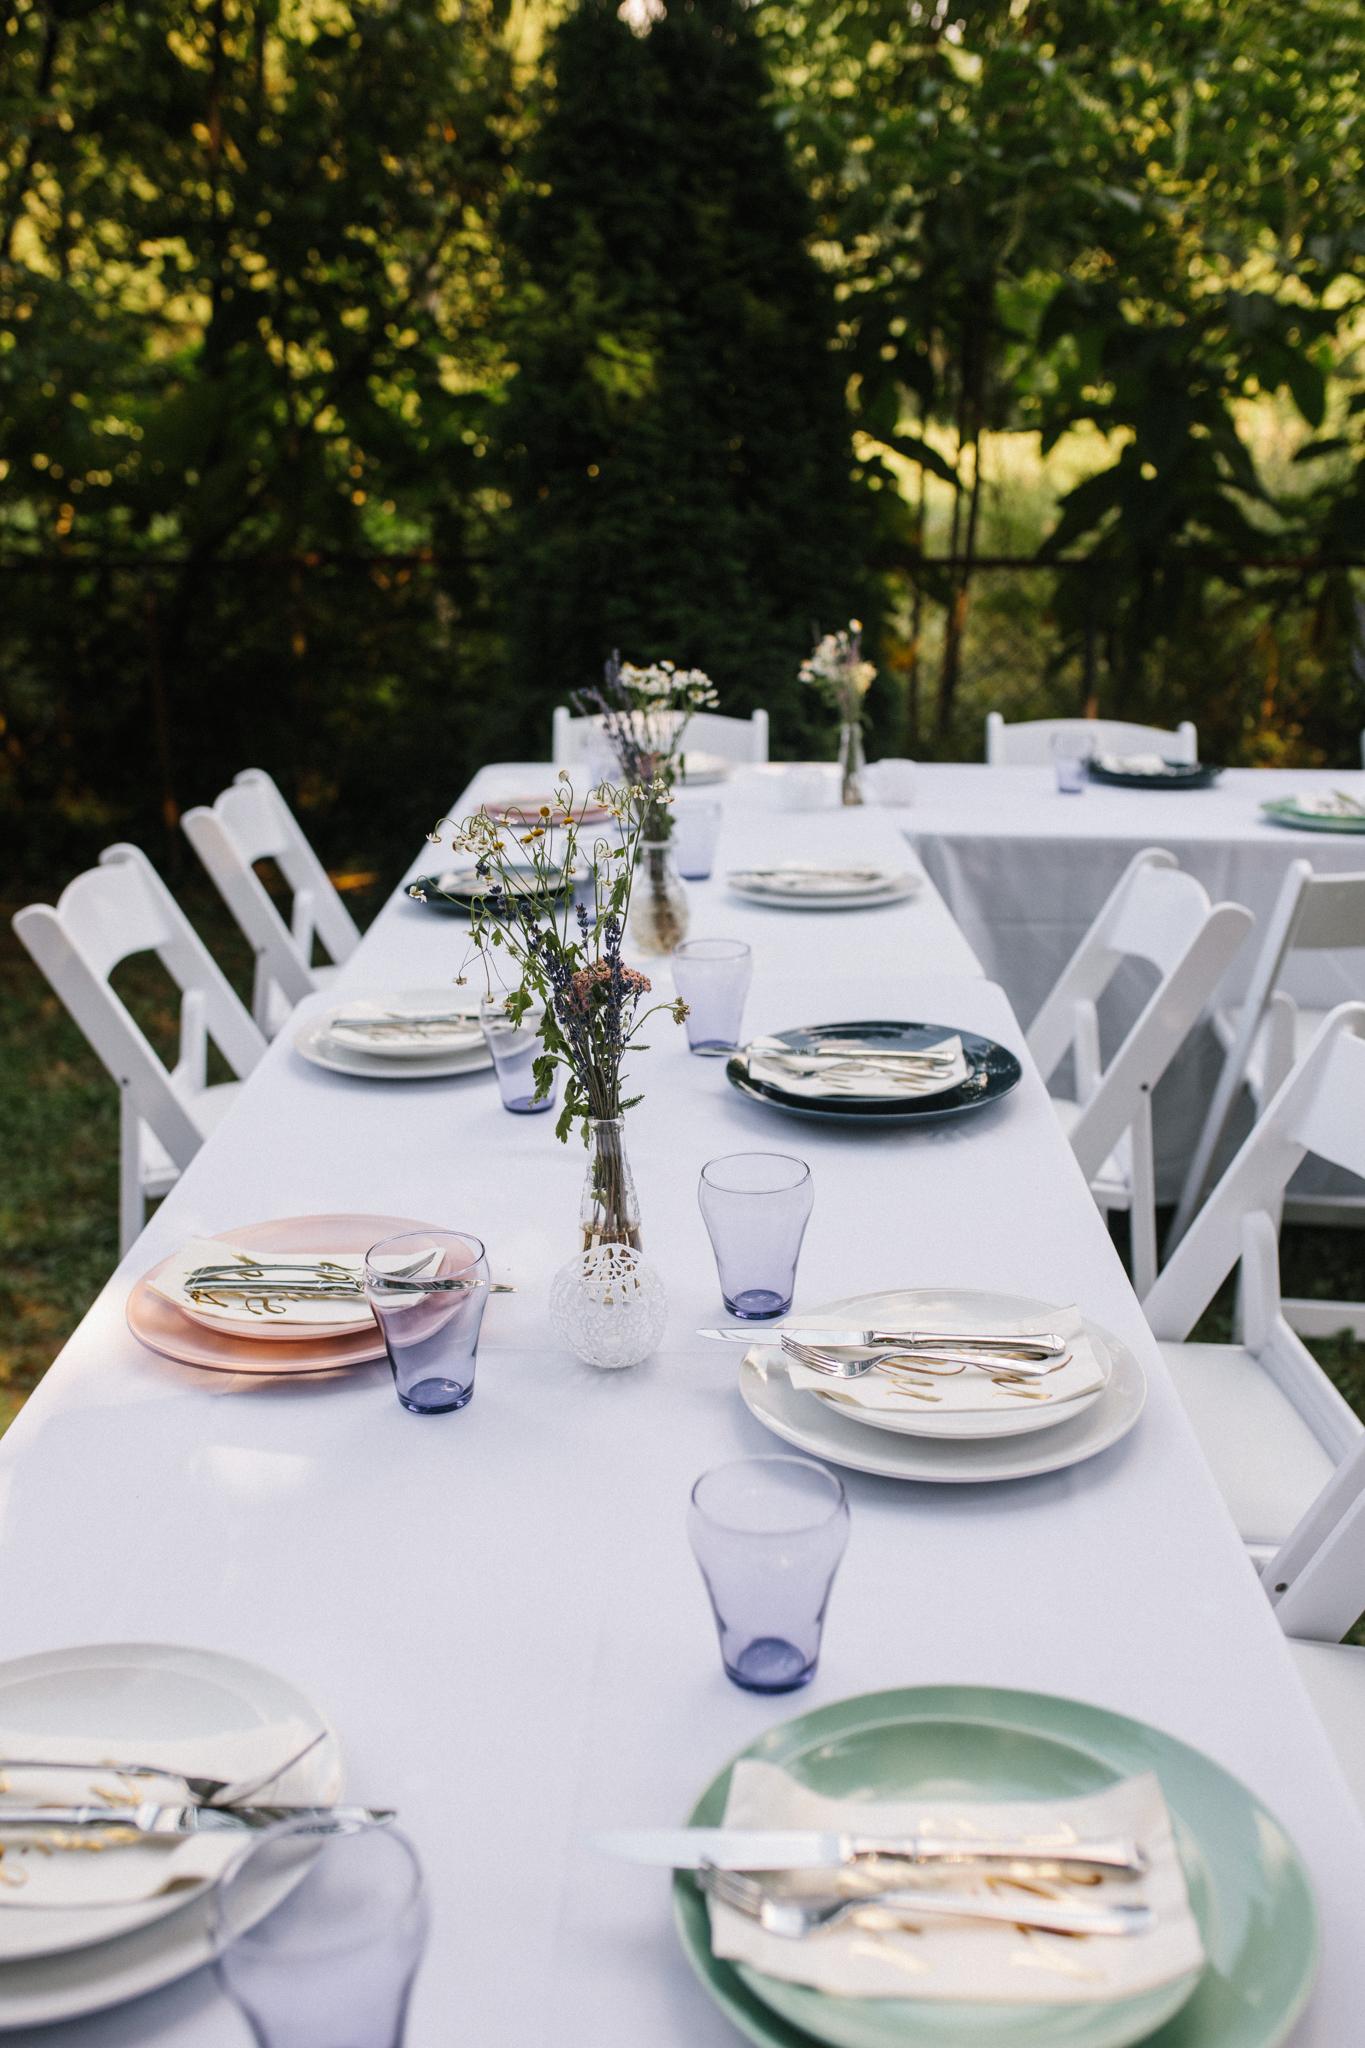 dorota_dwight_richmond_backyard_wedding-19.jpg